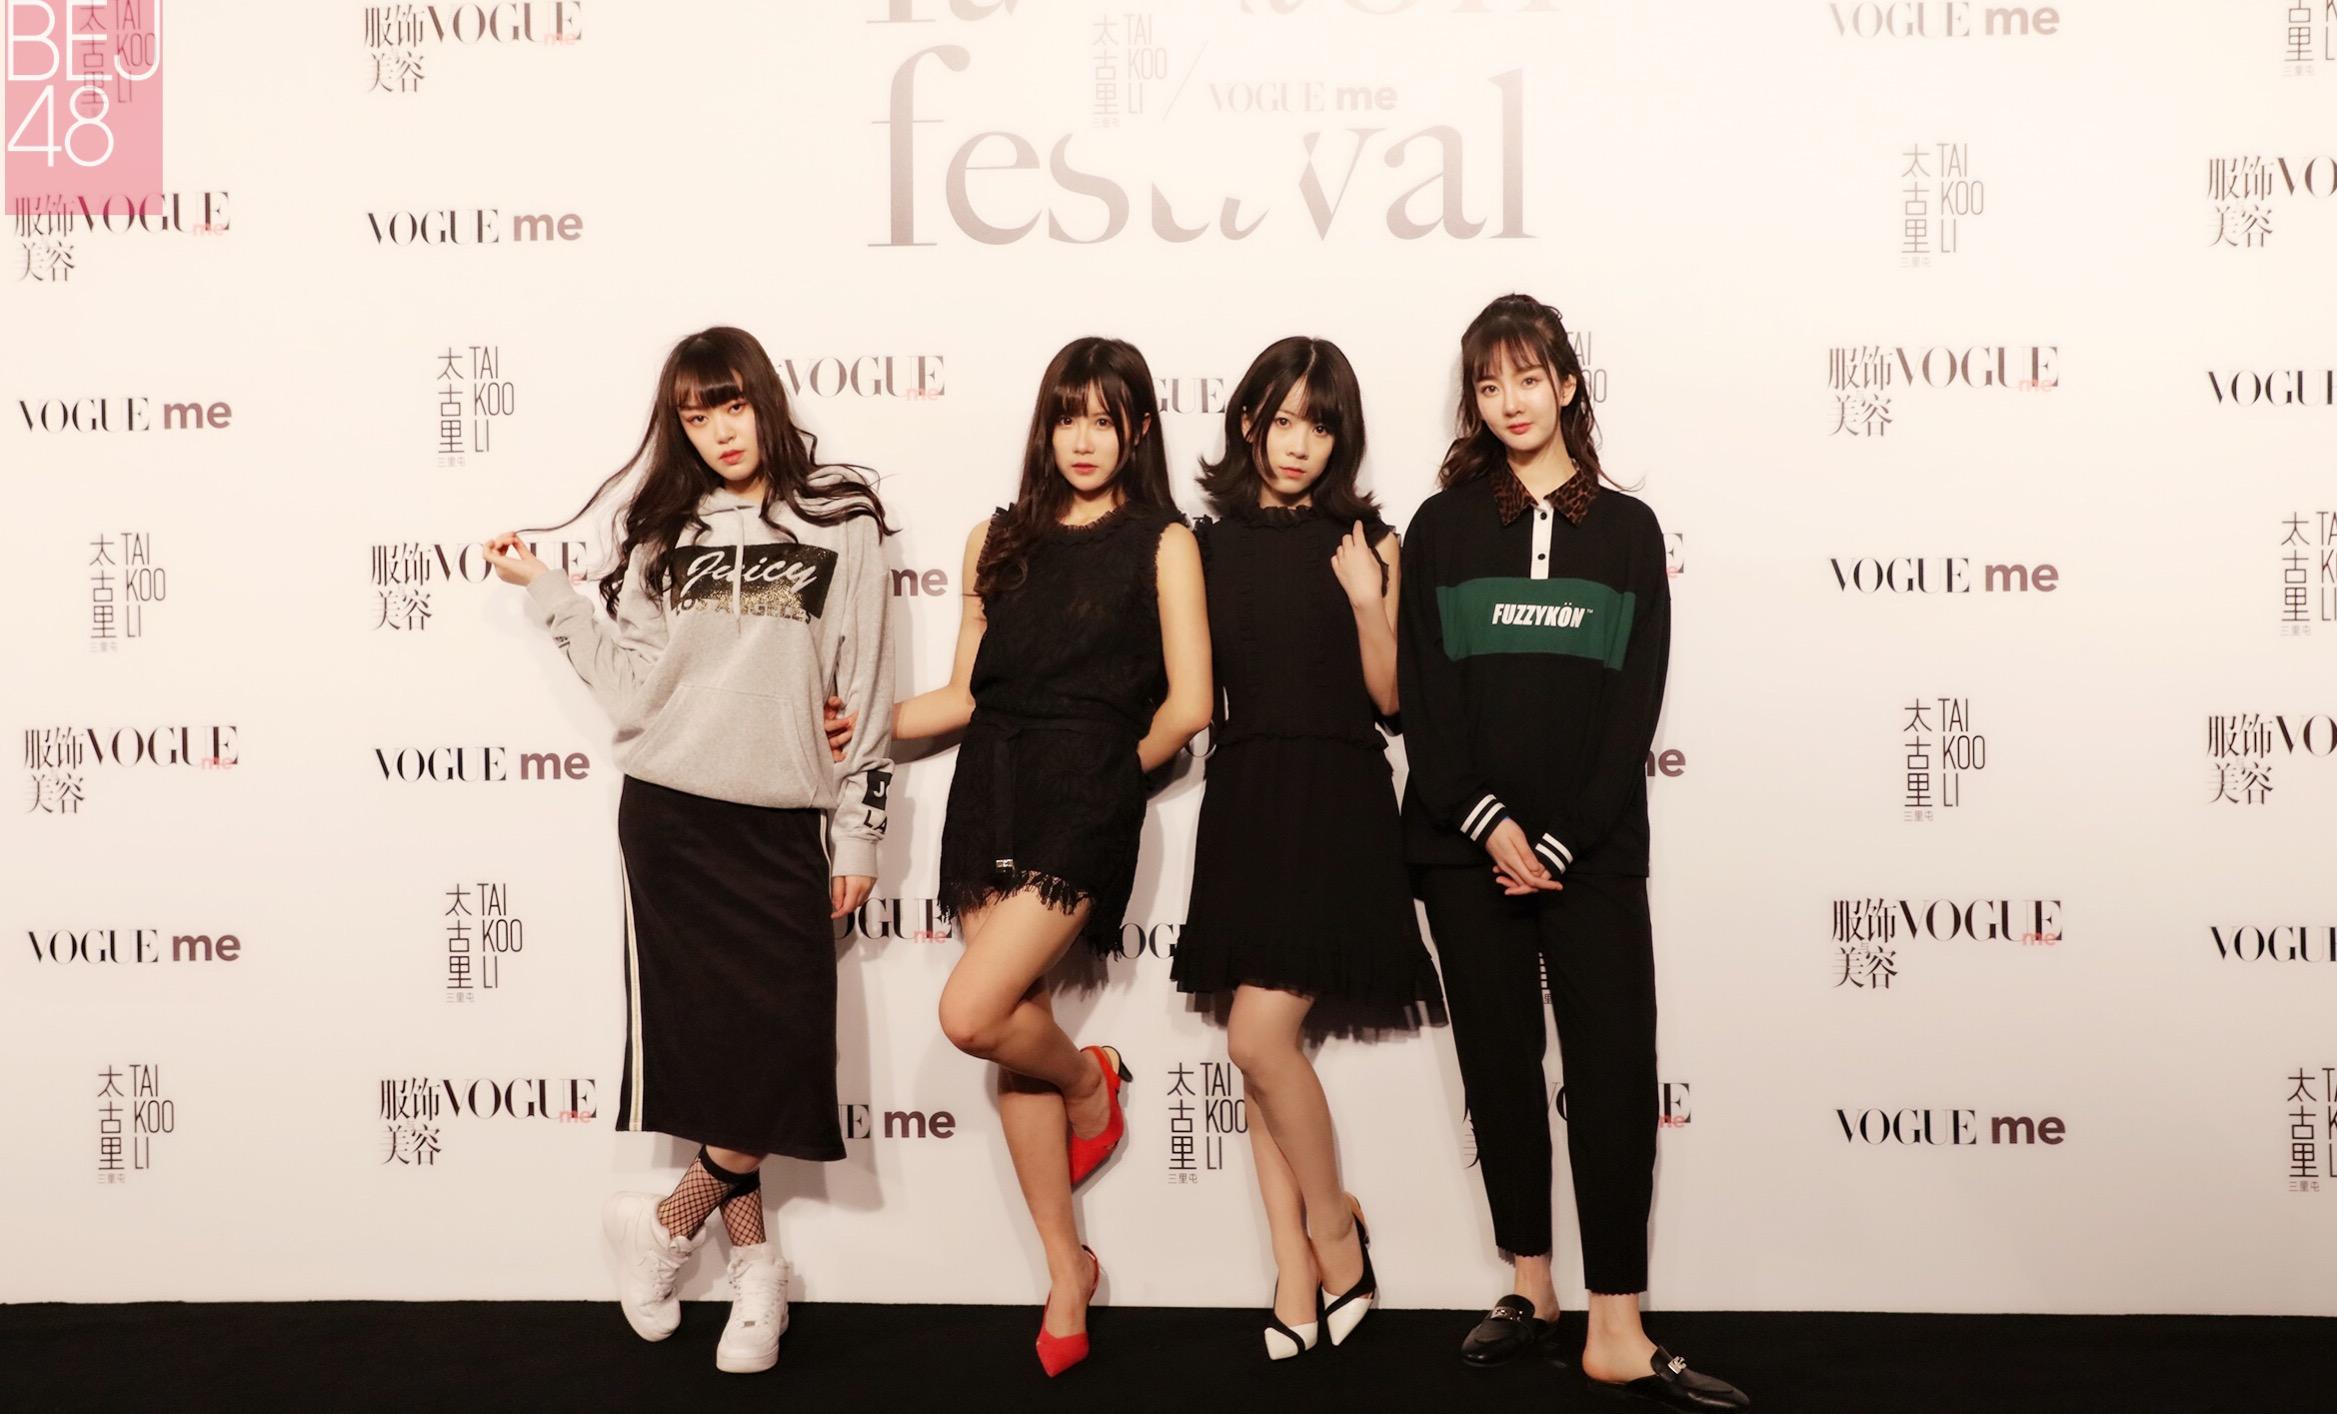 BEJ48成员受邀出席《VogueMe》一周年时尚派对